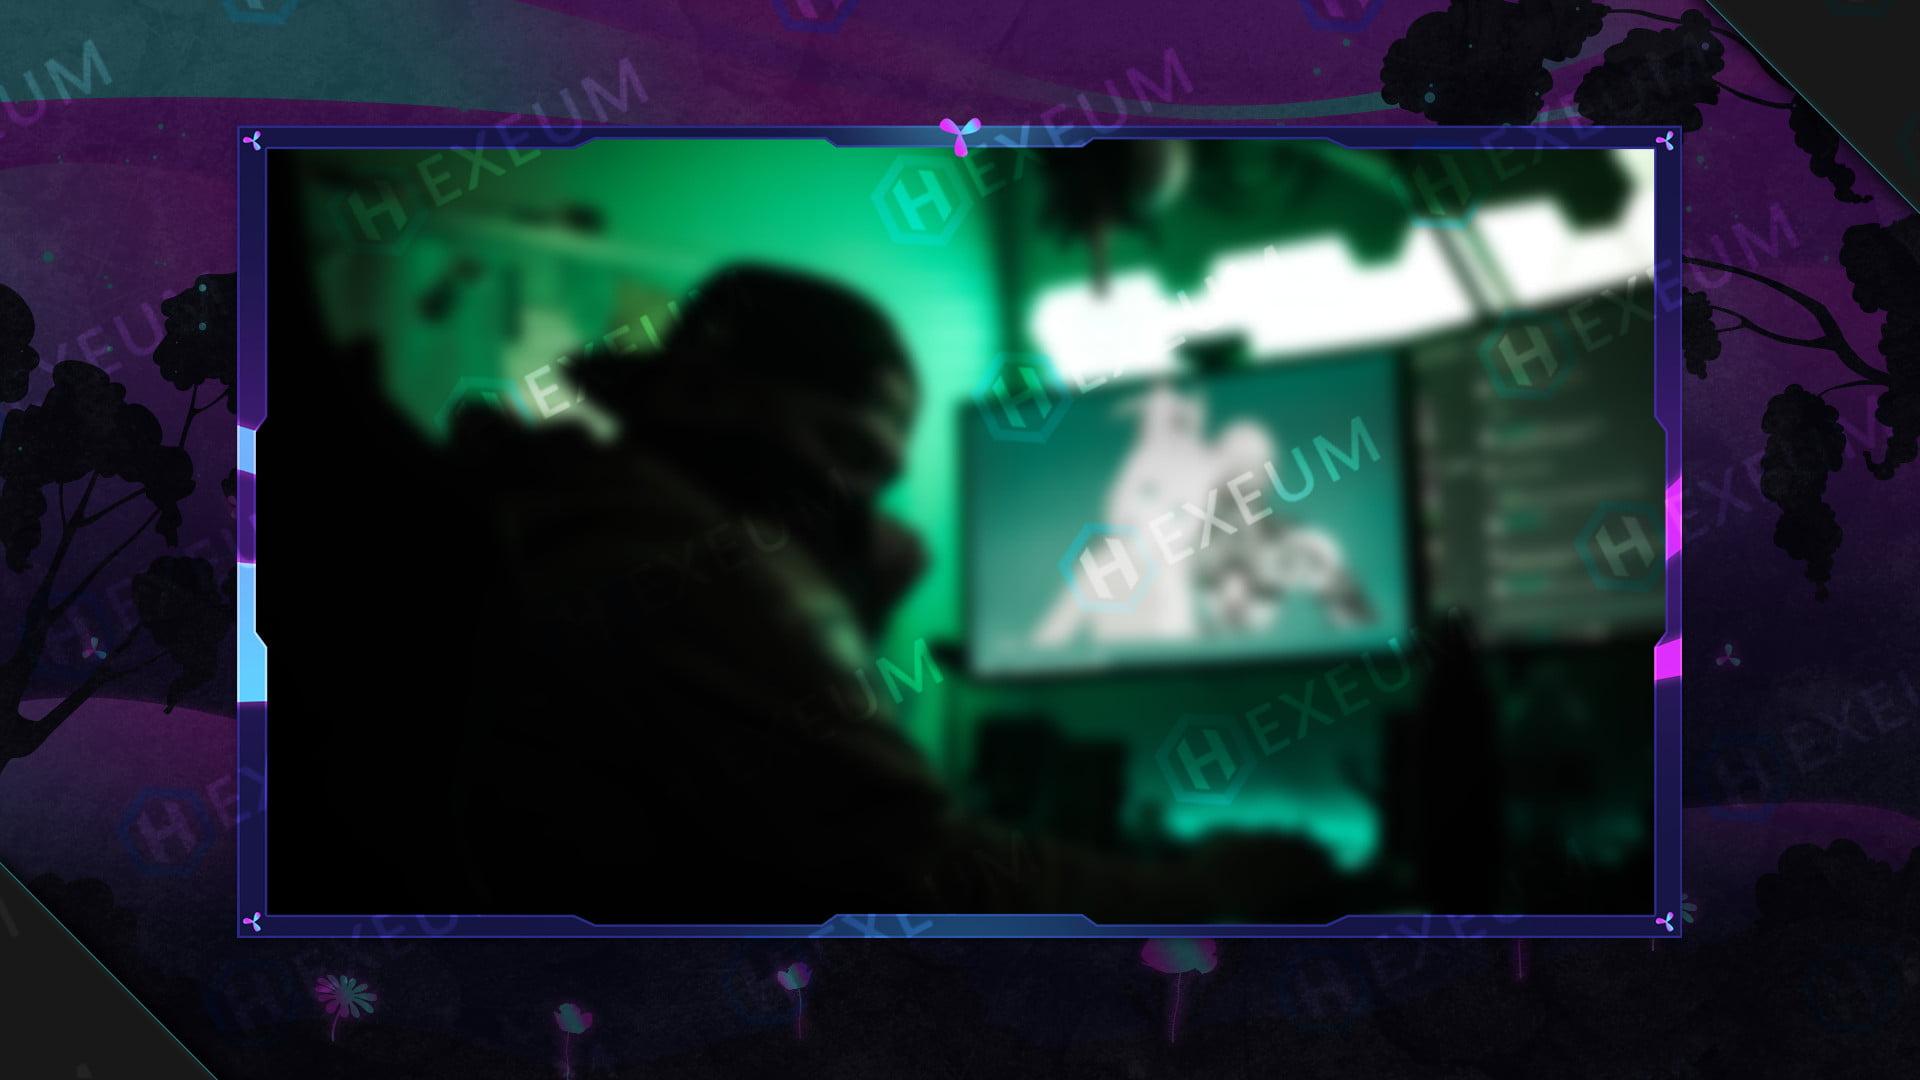 fantasy webcam overlay